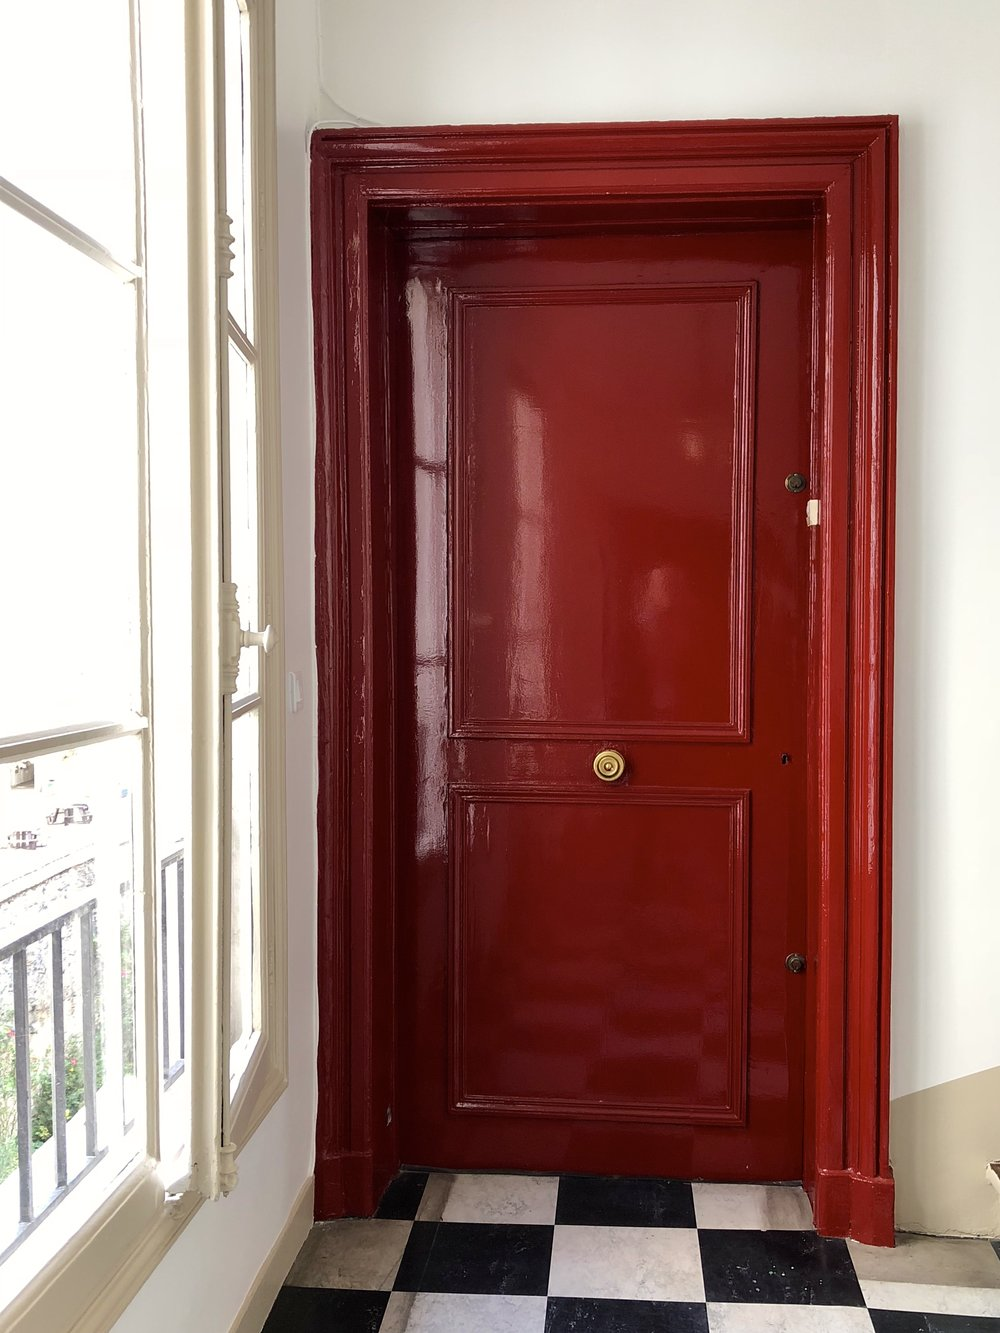 Door into the apartment